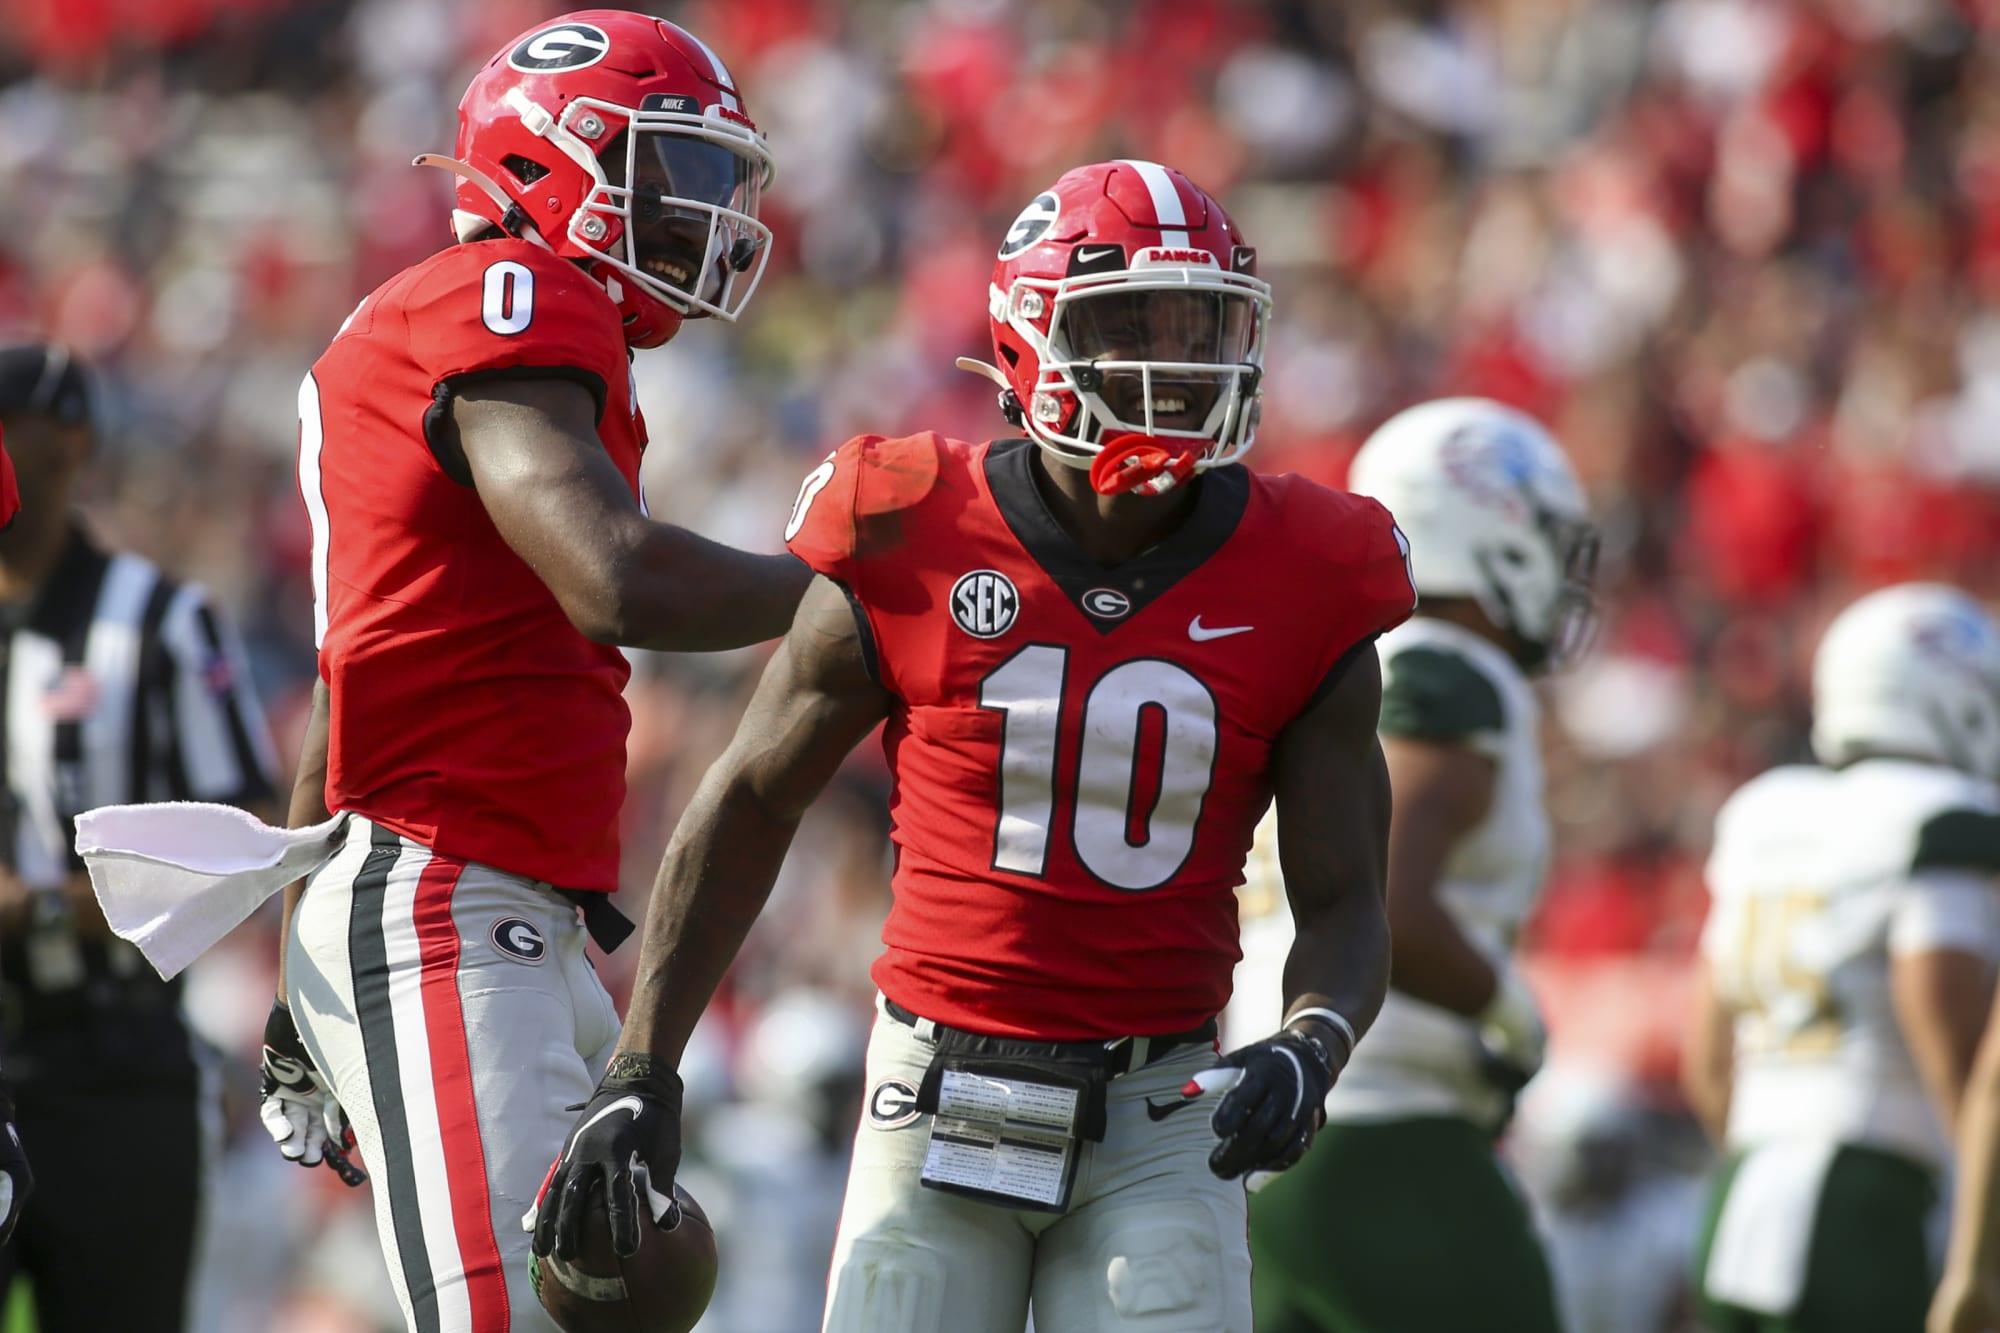 Georgia Football: Bulldogs' health is on the right track